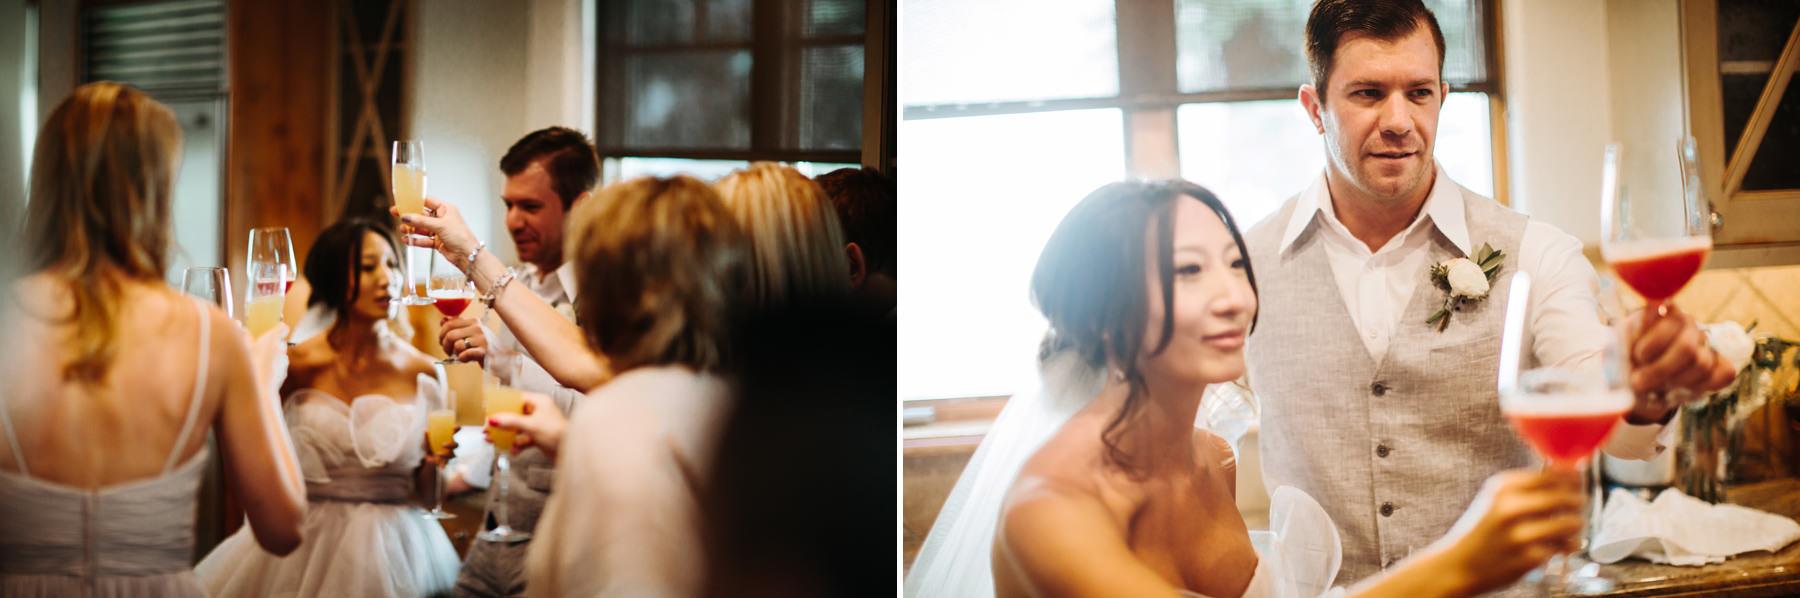 Vail Colorado Wedding Deck_ Kindling Wedding Photography49.JPG